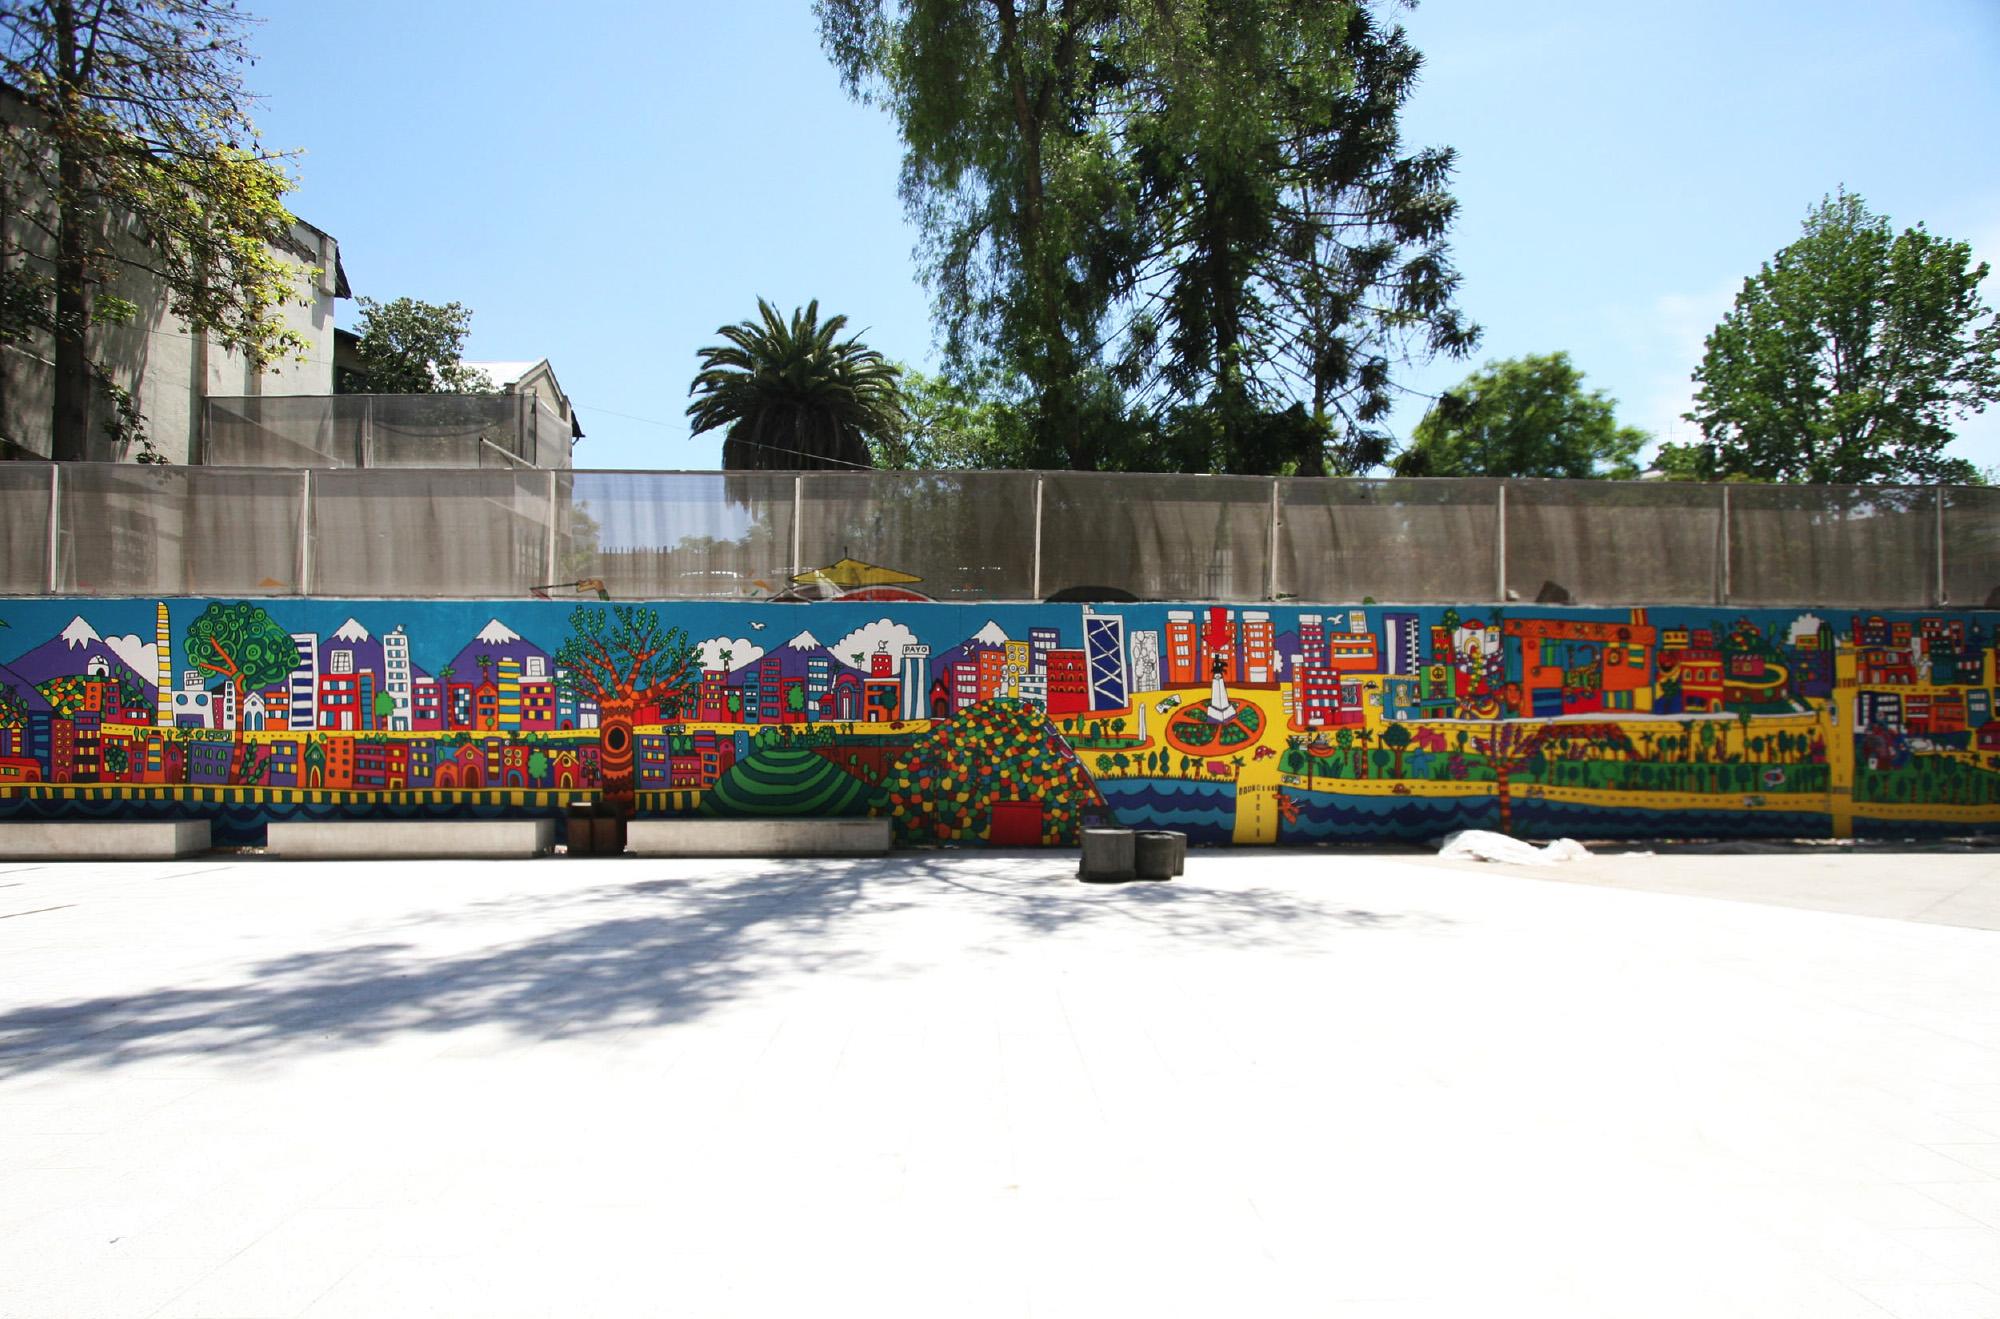 Mural santiago plaza socalo gam plataforma urbana for Carpenter papel mural santiago chile